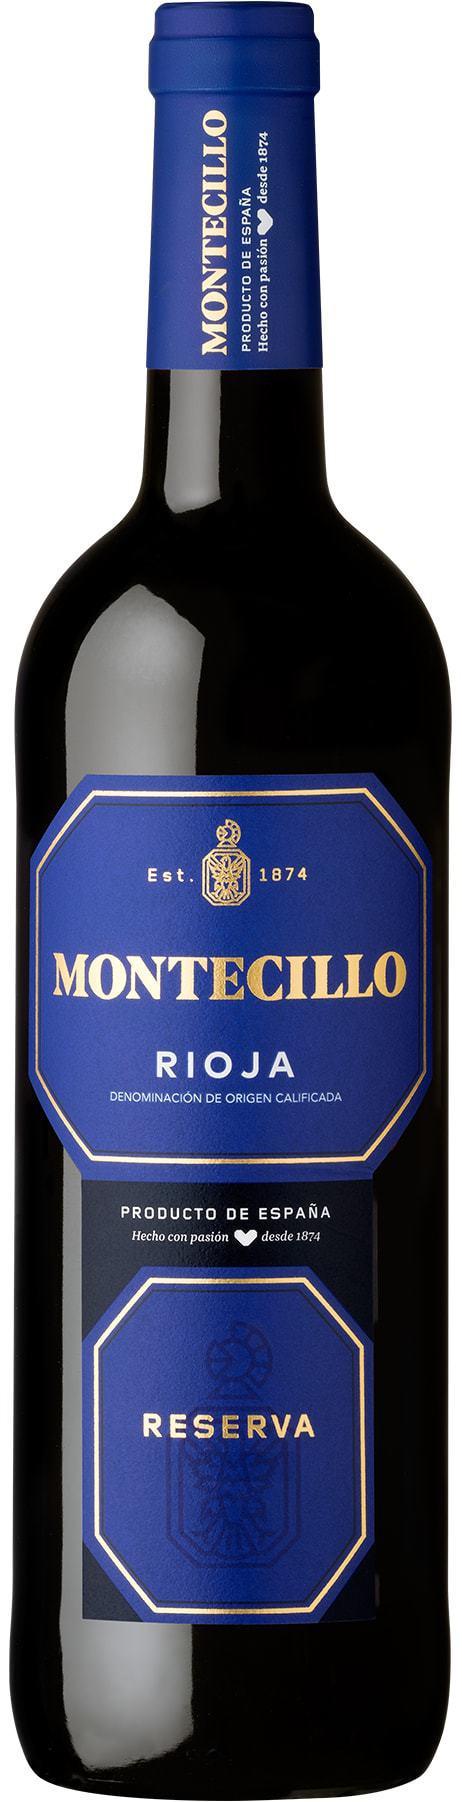 Bodega Montecillo 2010 Reserva Rioja